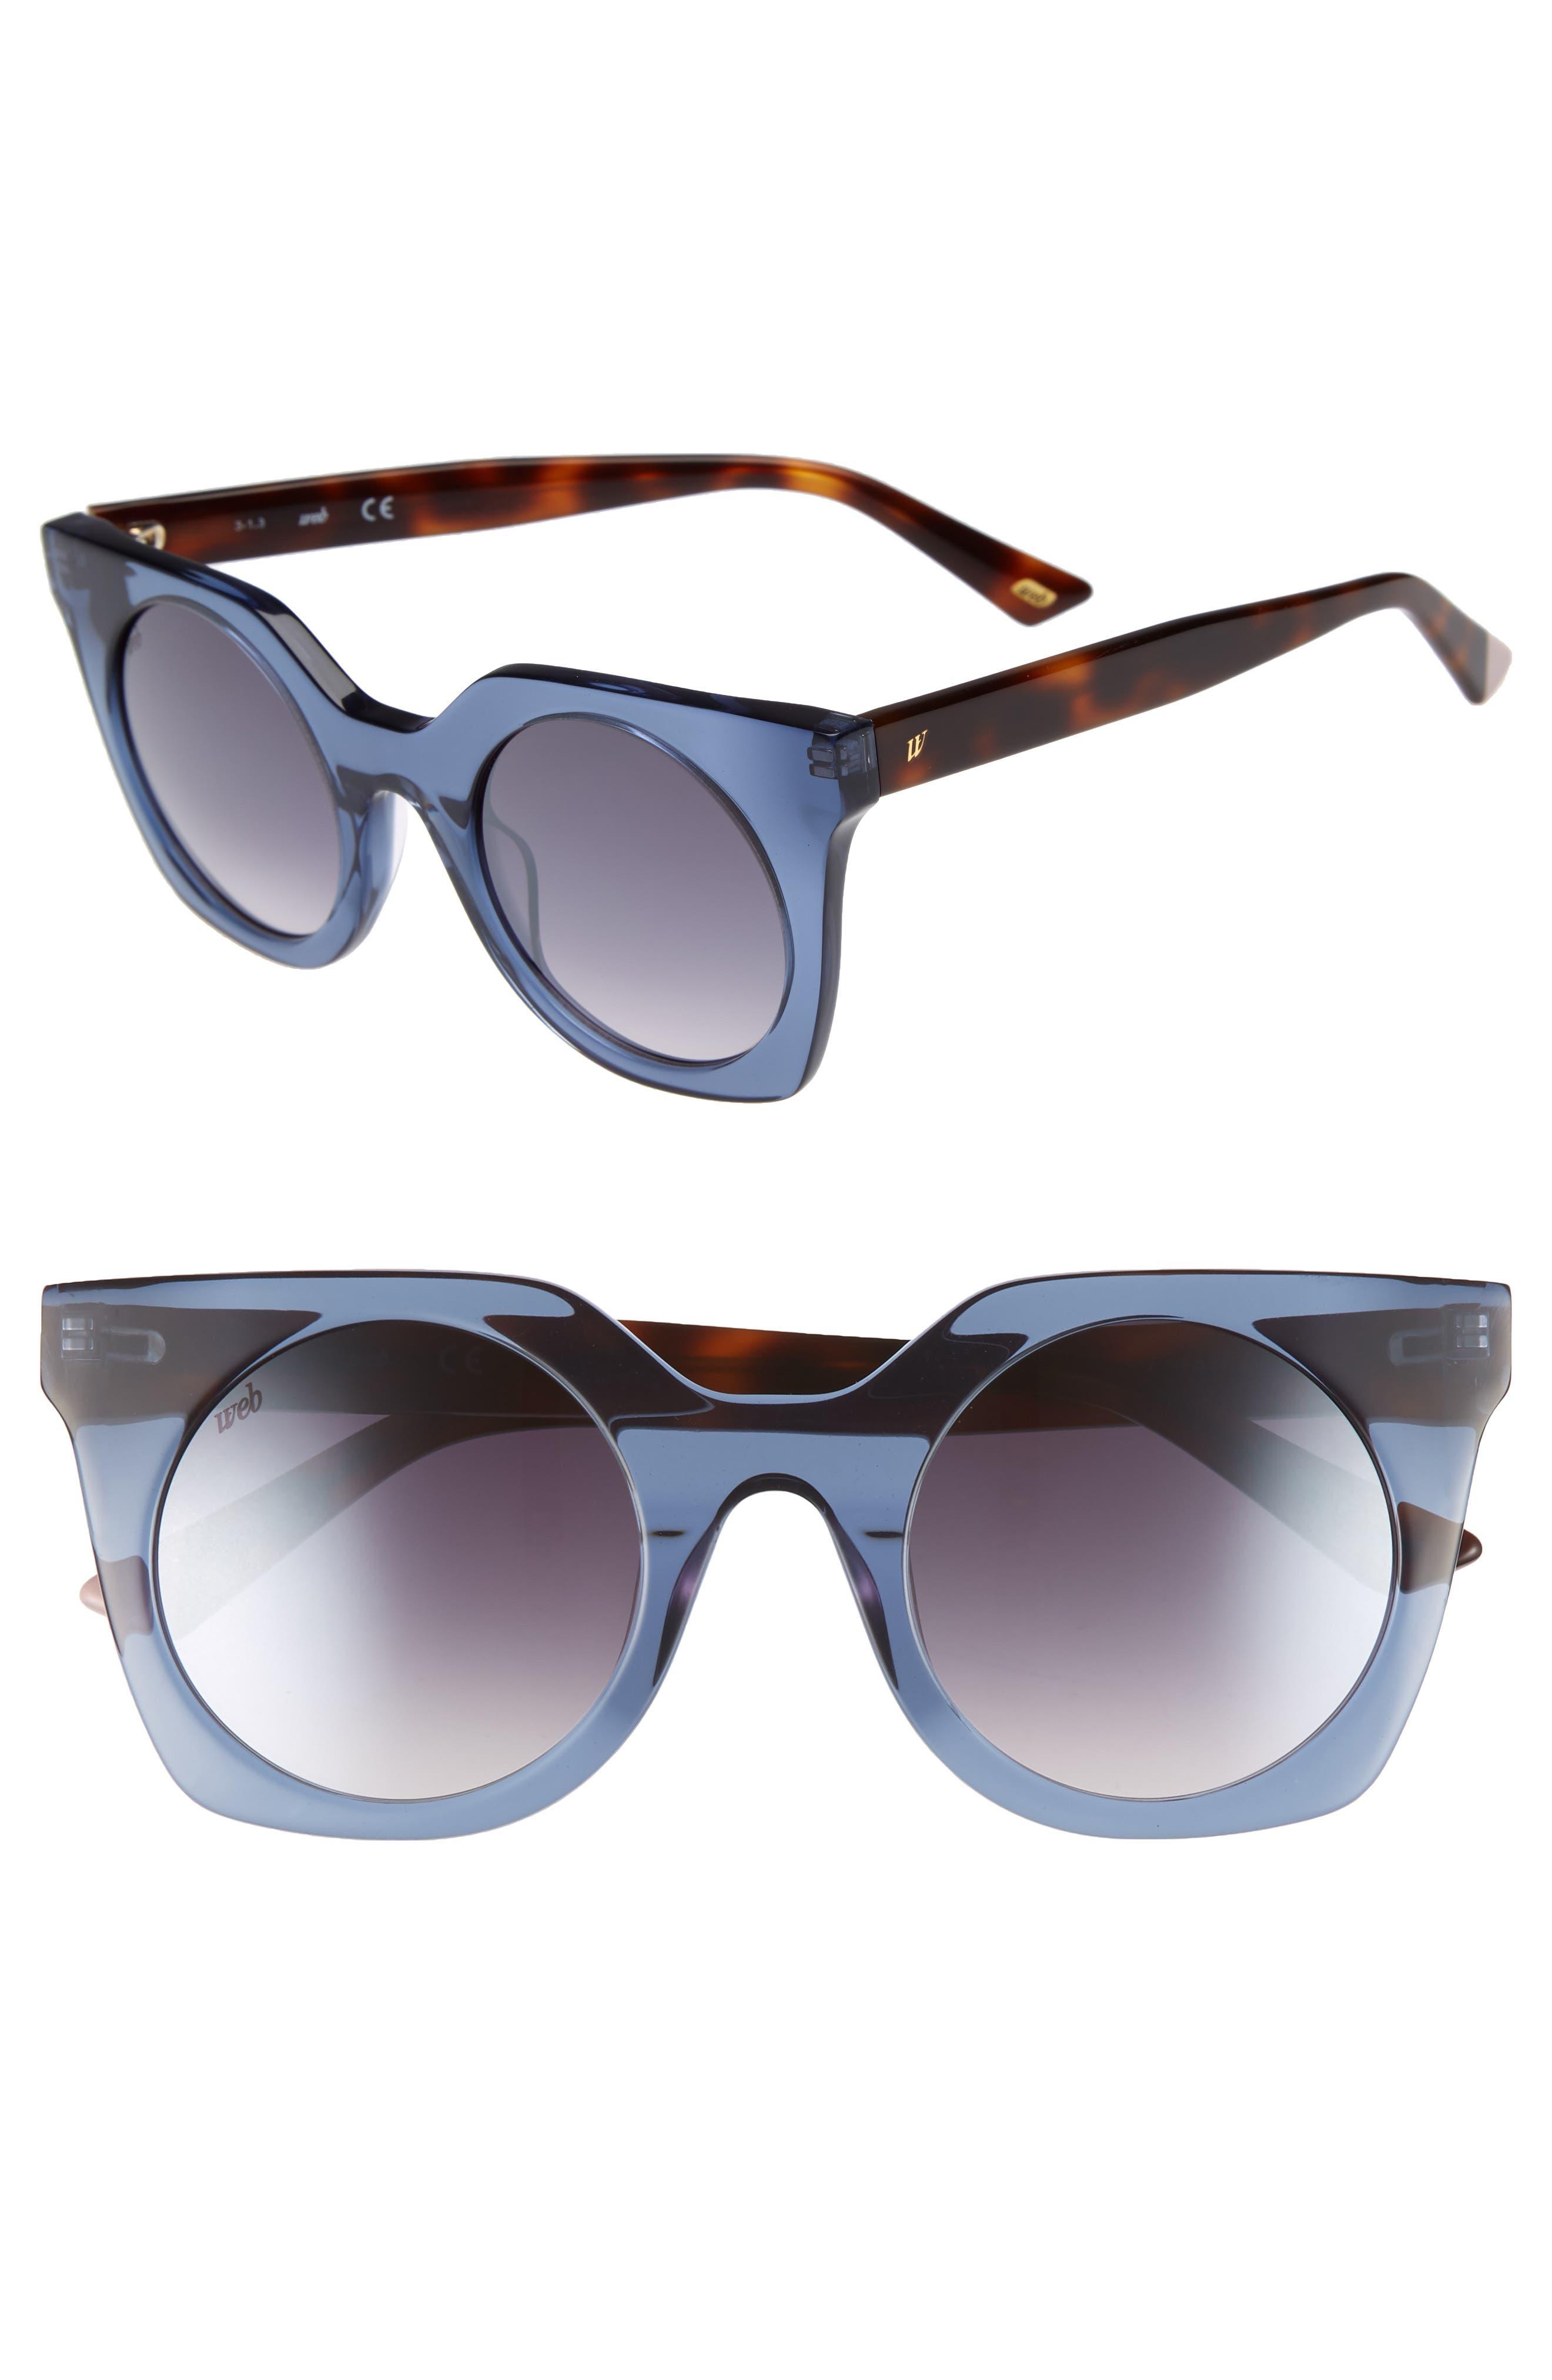 48mm Sunglasses,                         Main,                         color, Shiny Blue/ Blue Mirror